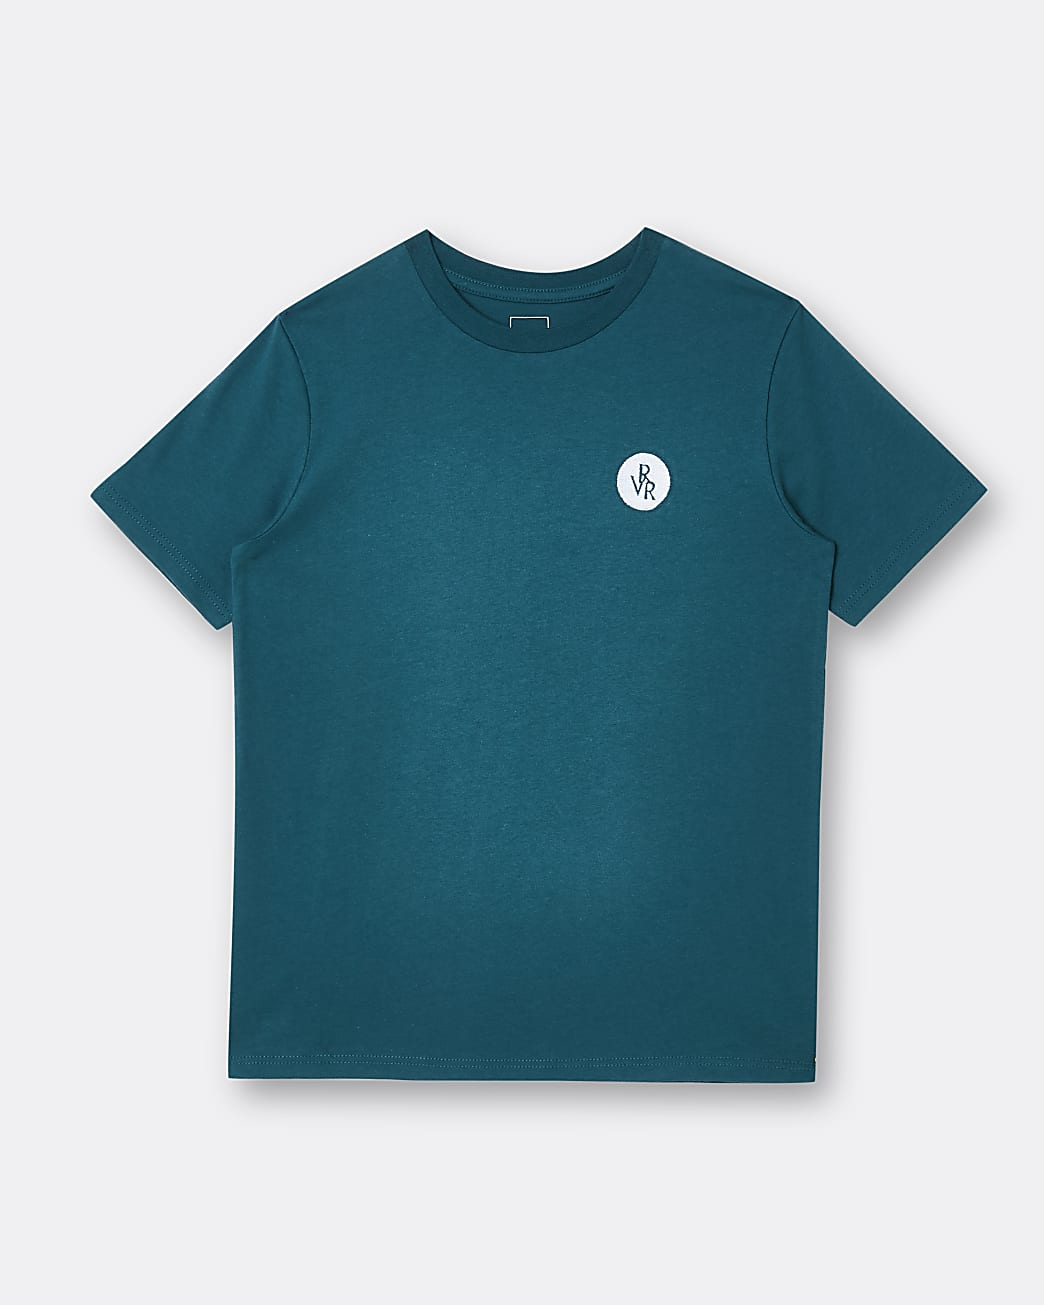 Boys green RVR t-shirt